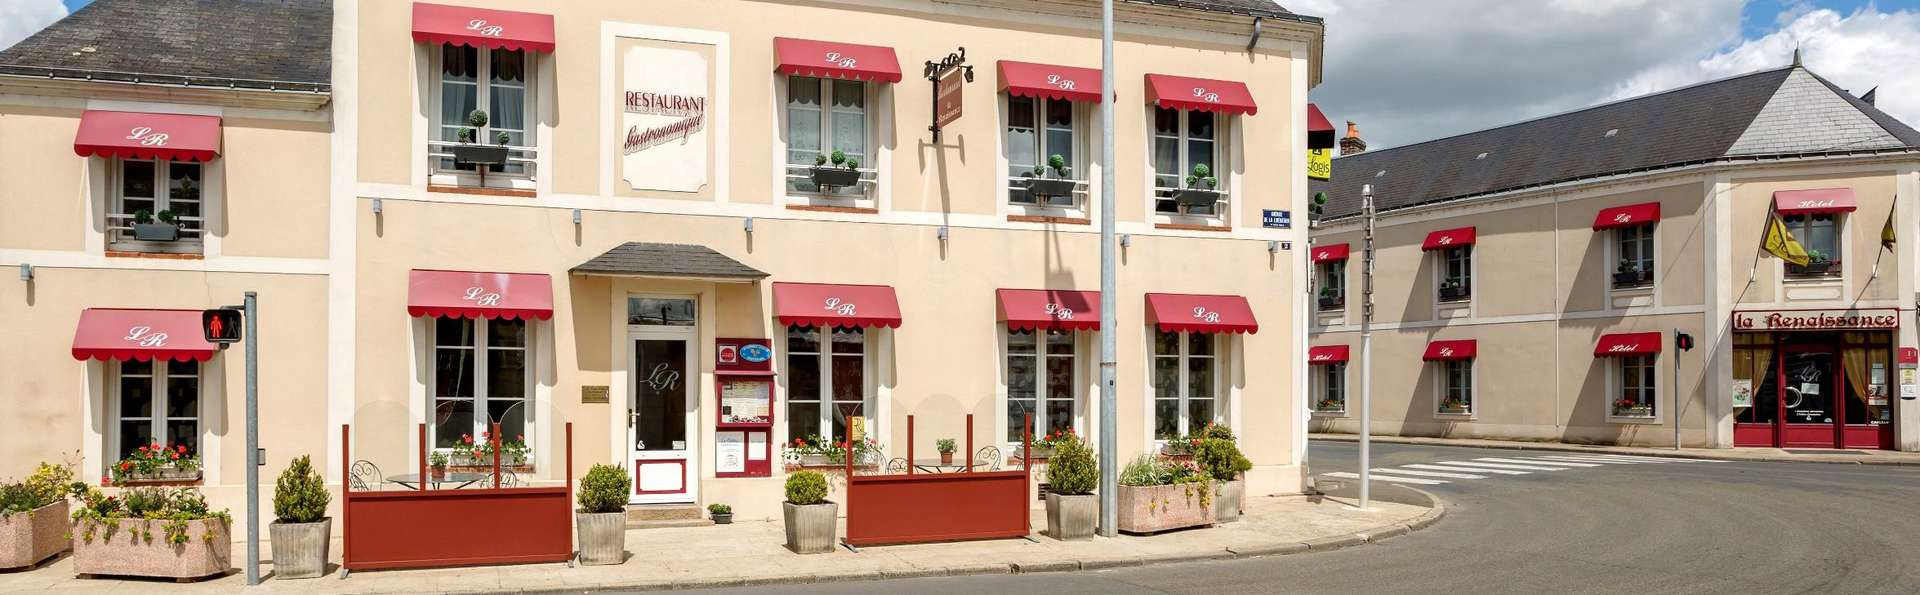 L'Auberge Alsacienne - dauberge_alsacienne.jpg